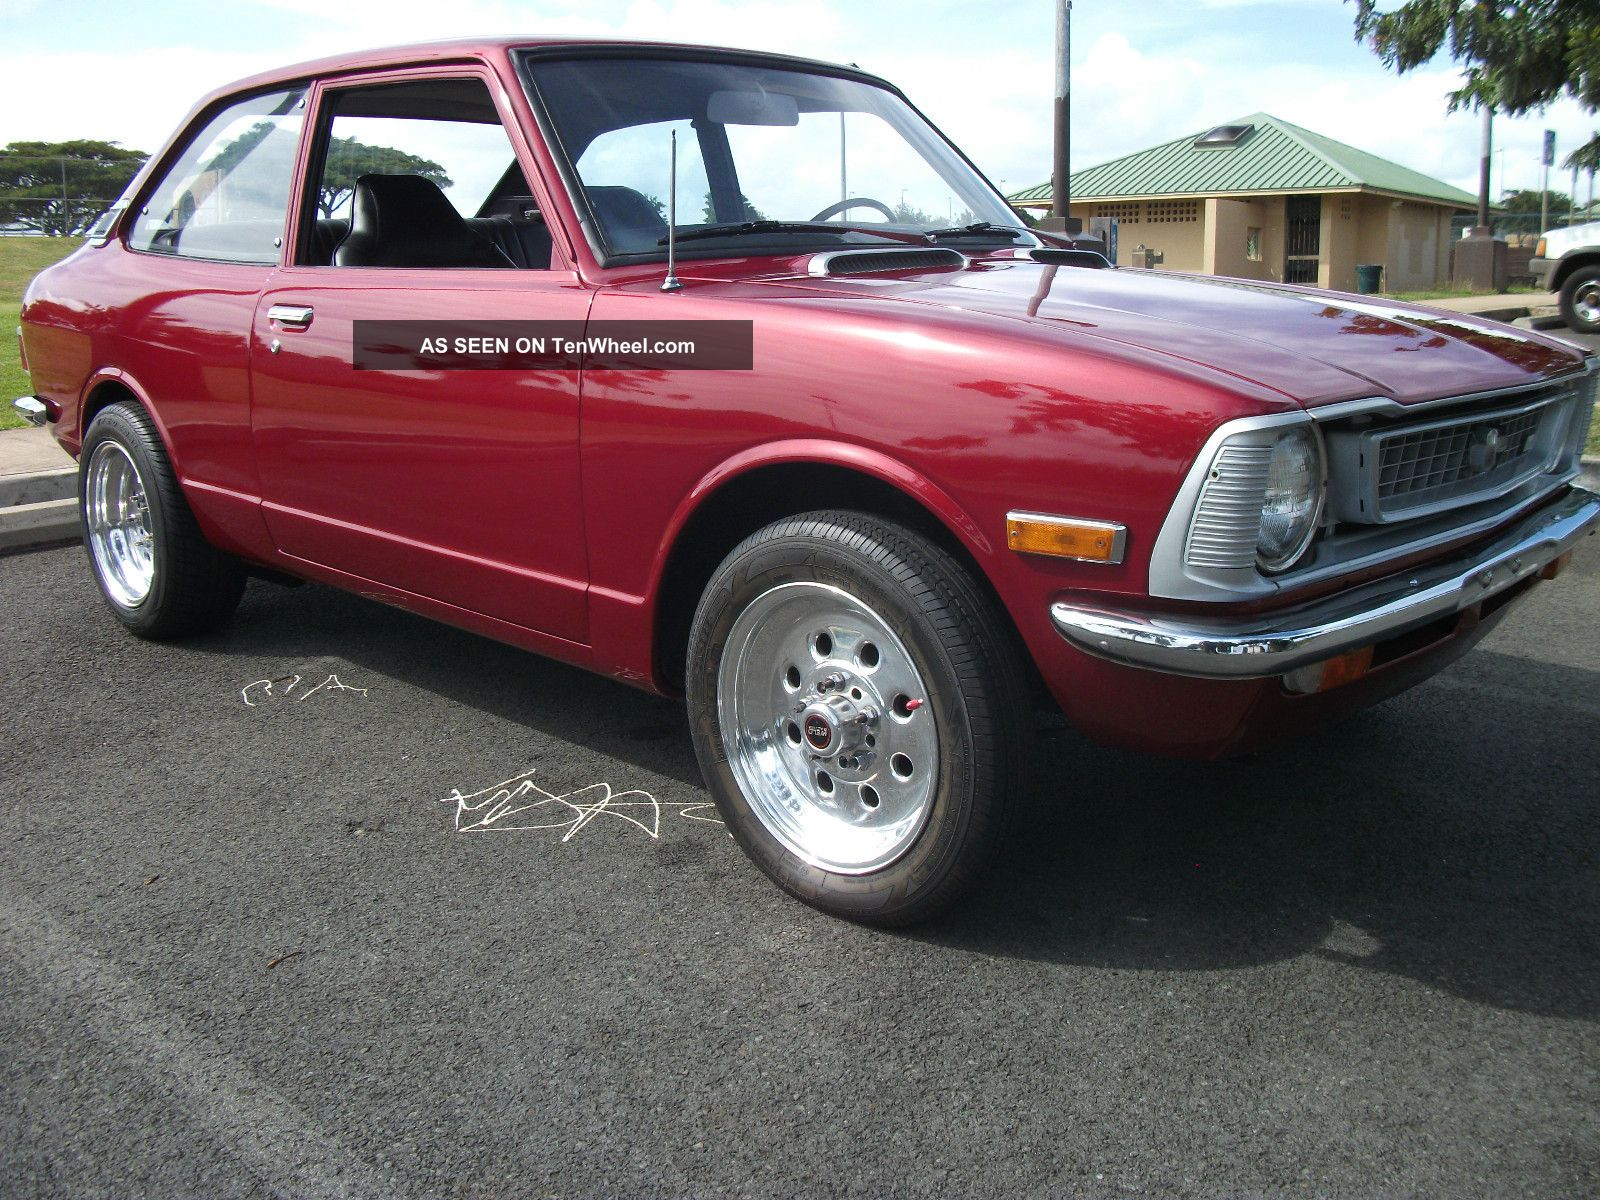 Honda Cars Of Corona >> Classic 1974 Toyota Corolla Sedan Condition, Custom Lexus Red Paint.